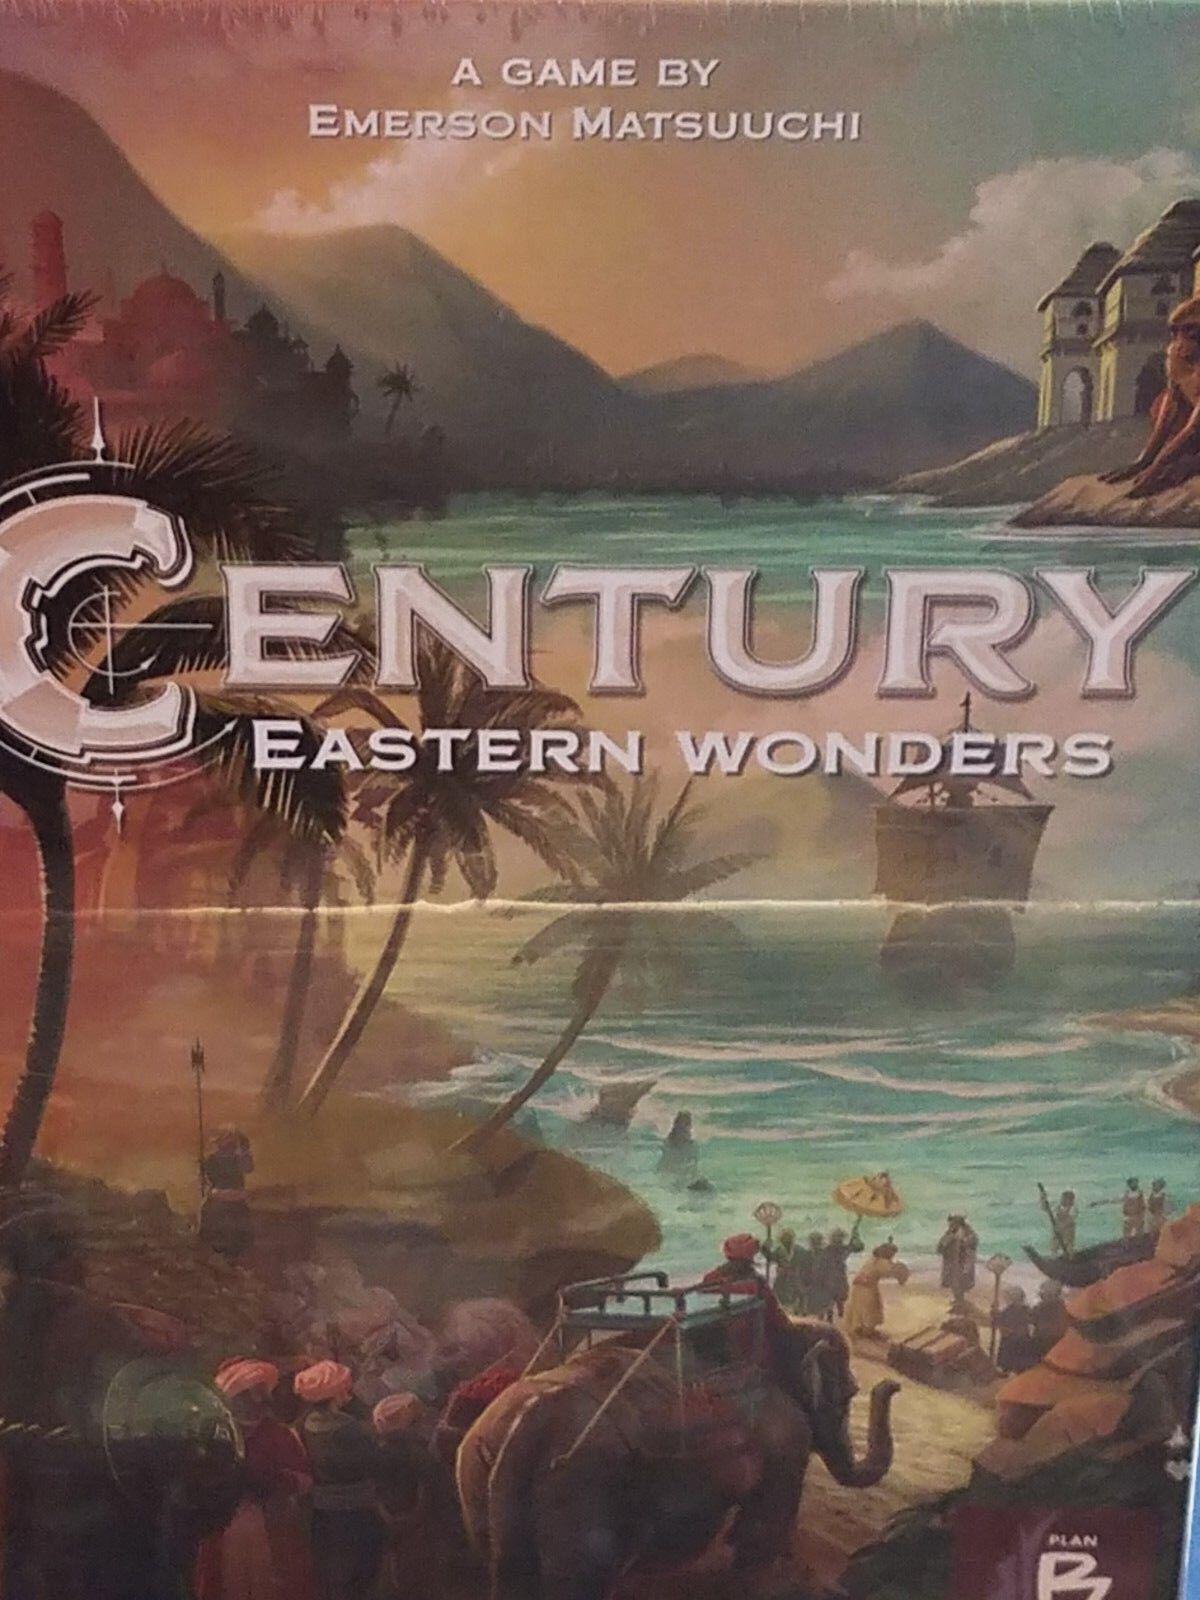 Century Eastern Wonders  - Plan B giocos tavola gioco nuovo  Spice strada Sequel   alta qualità